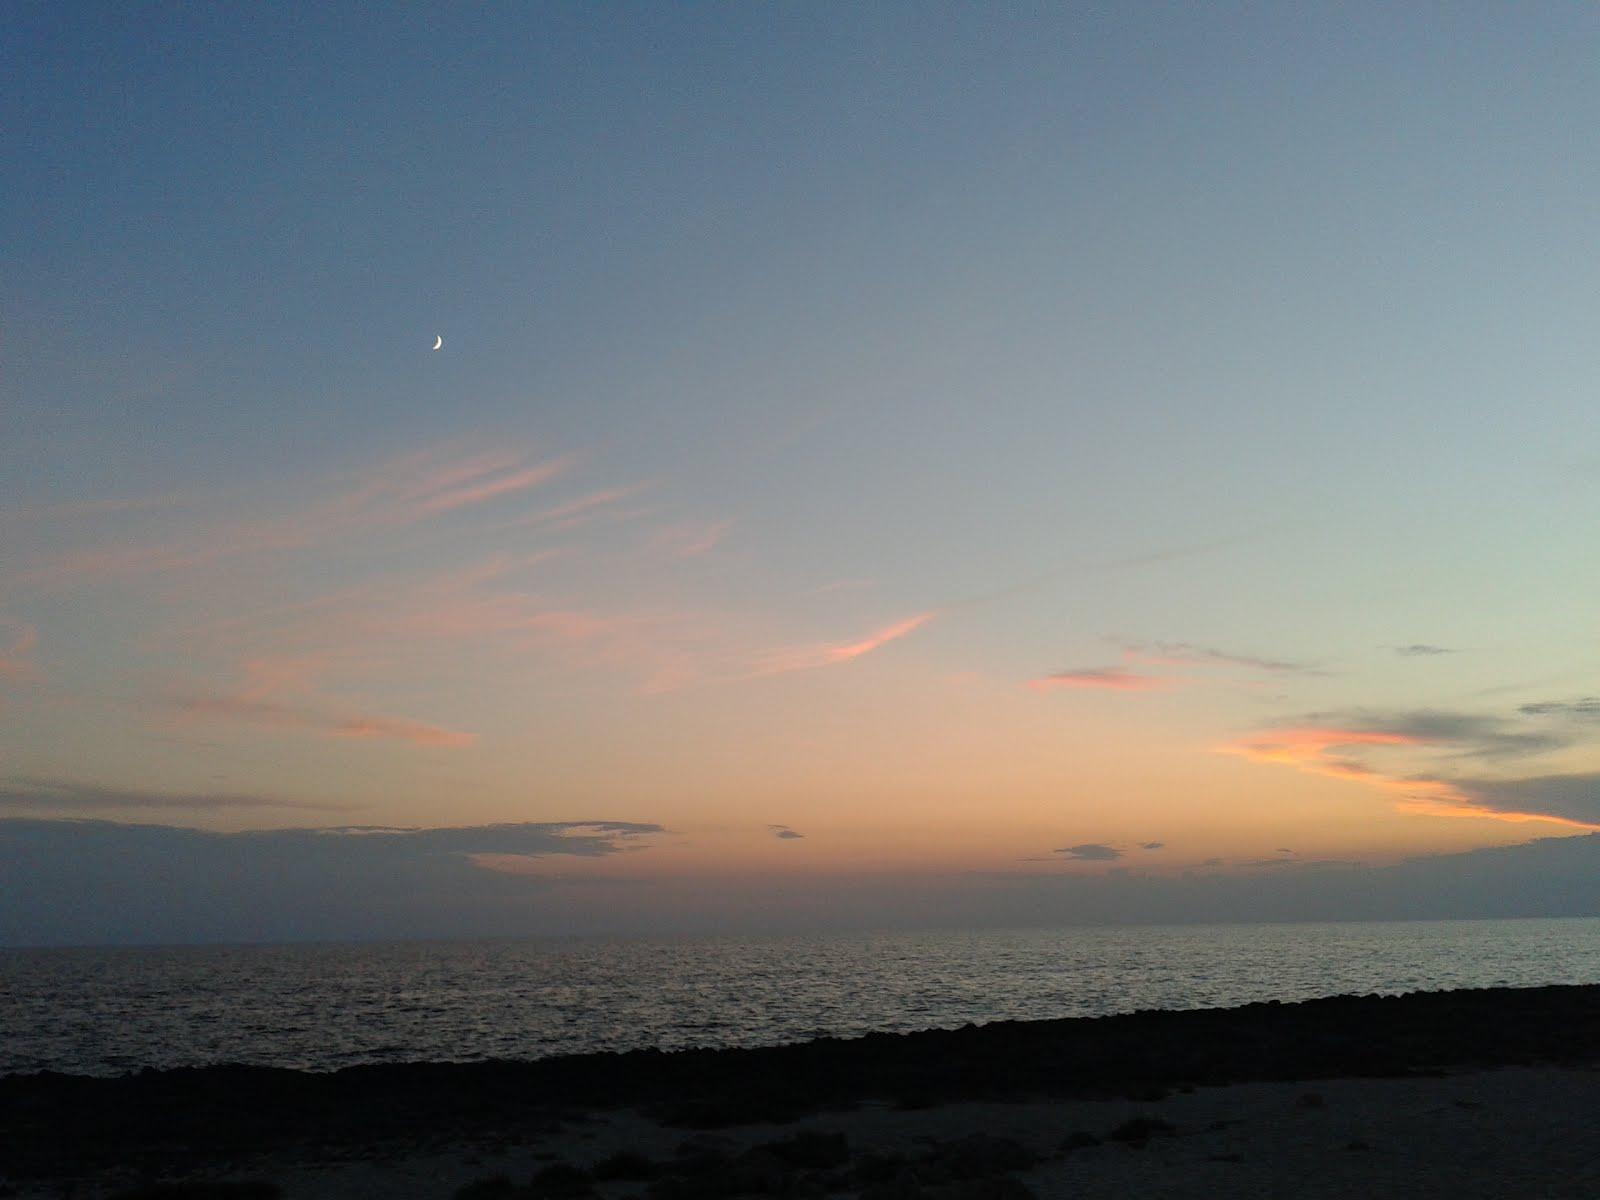 tramonto salentino